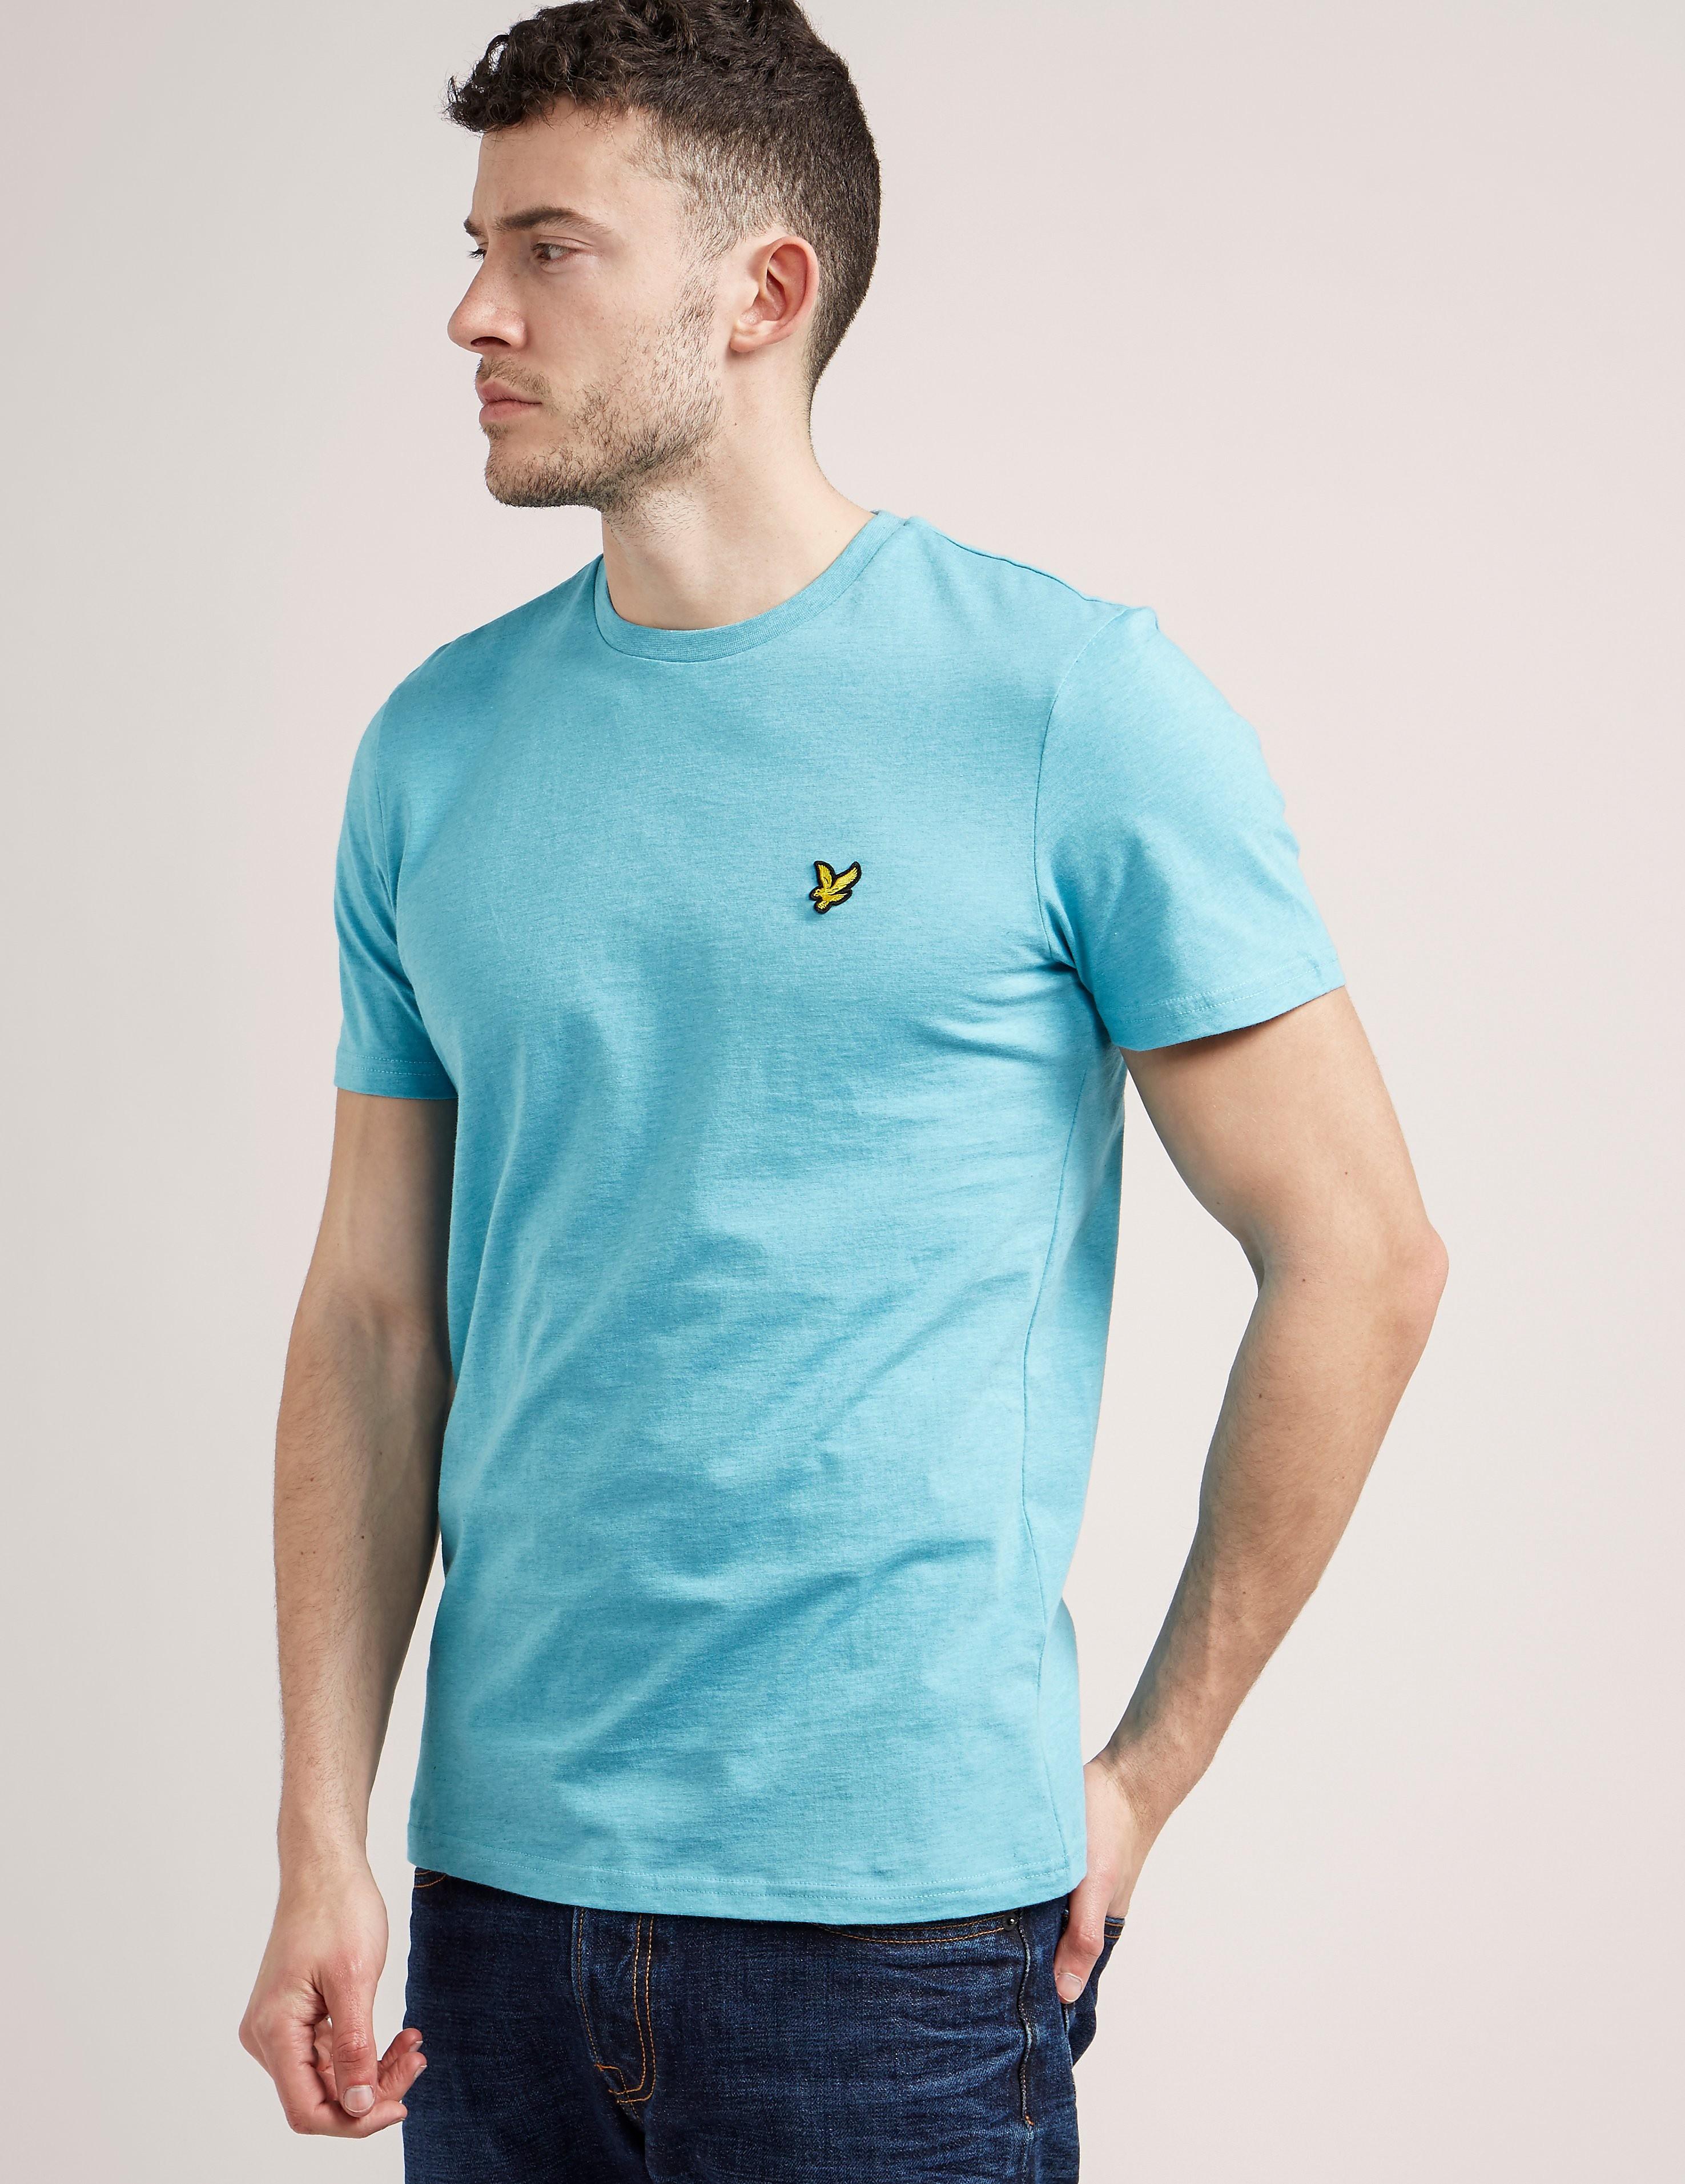 Lyle & Scott Crew T-Shirt